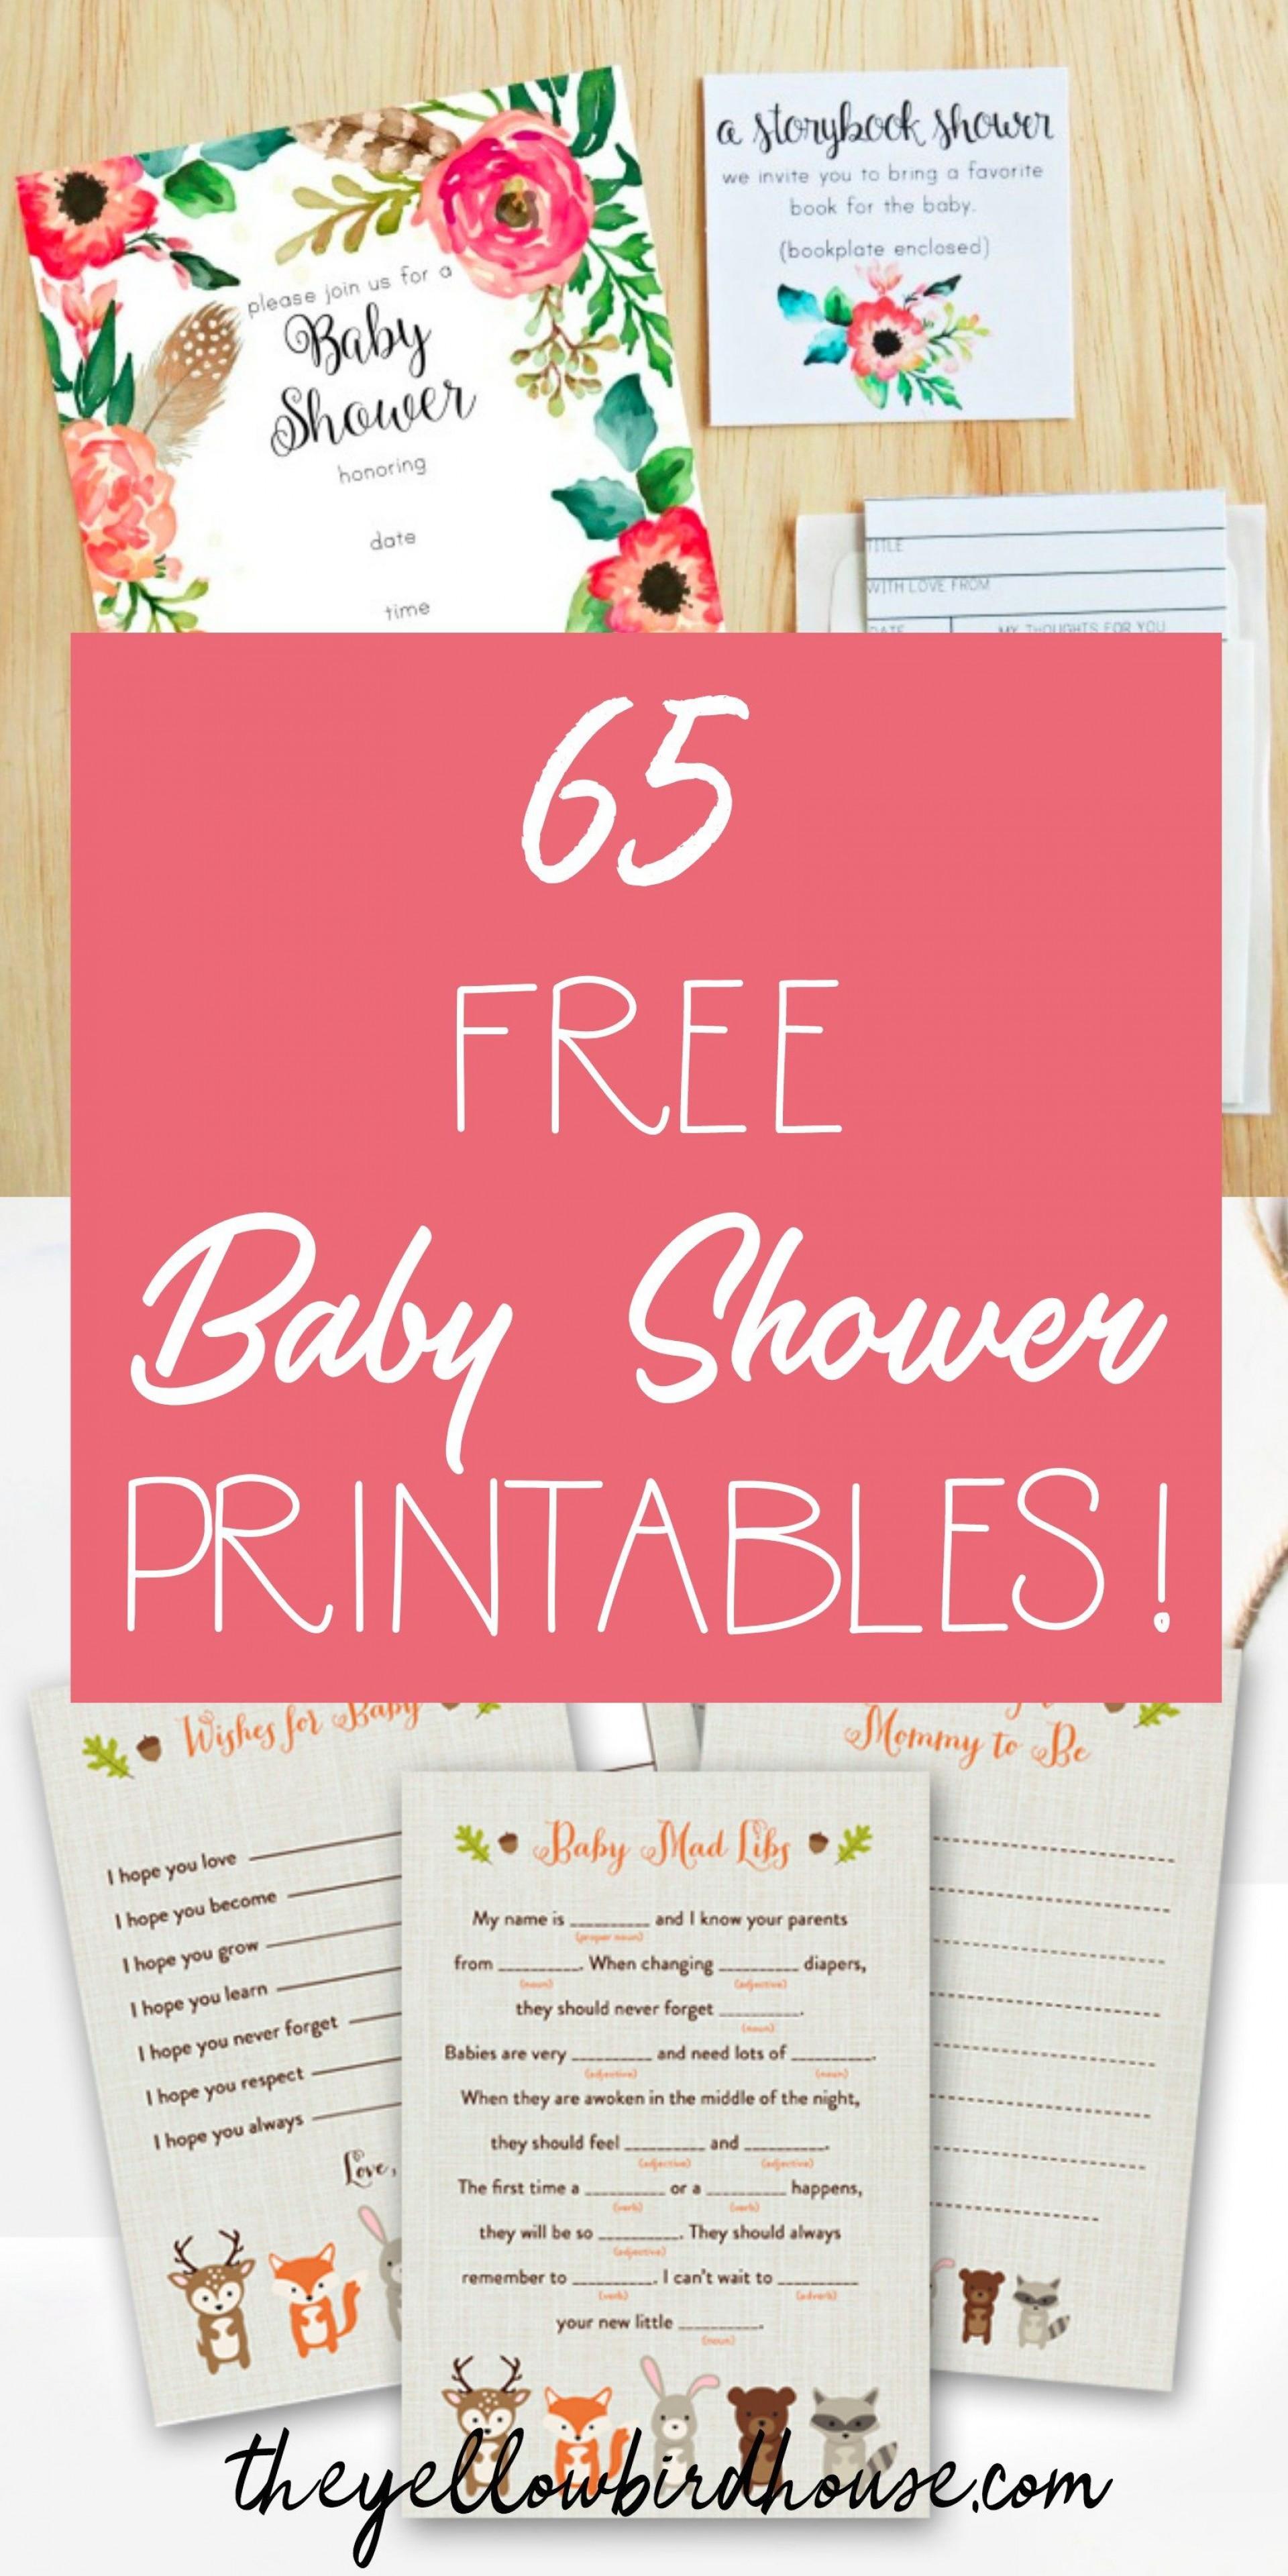 009 Simple Free Baby Shower Printable Elephant Inspiration  Decoration1920